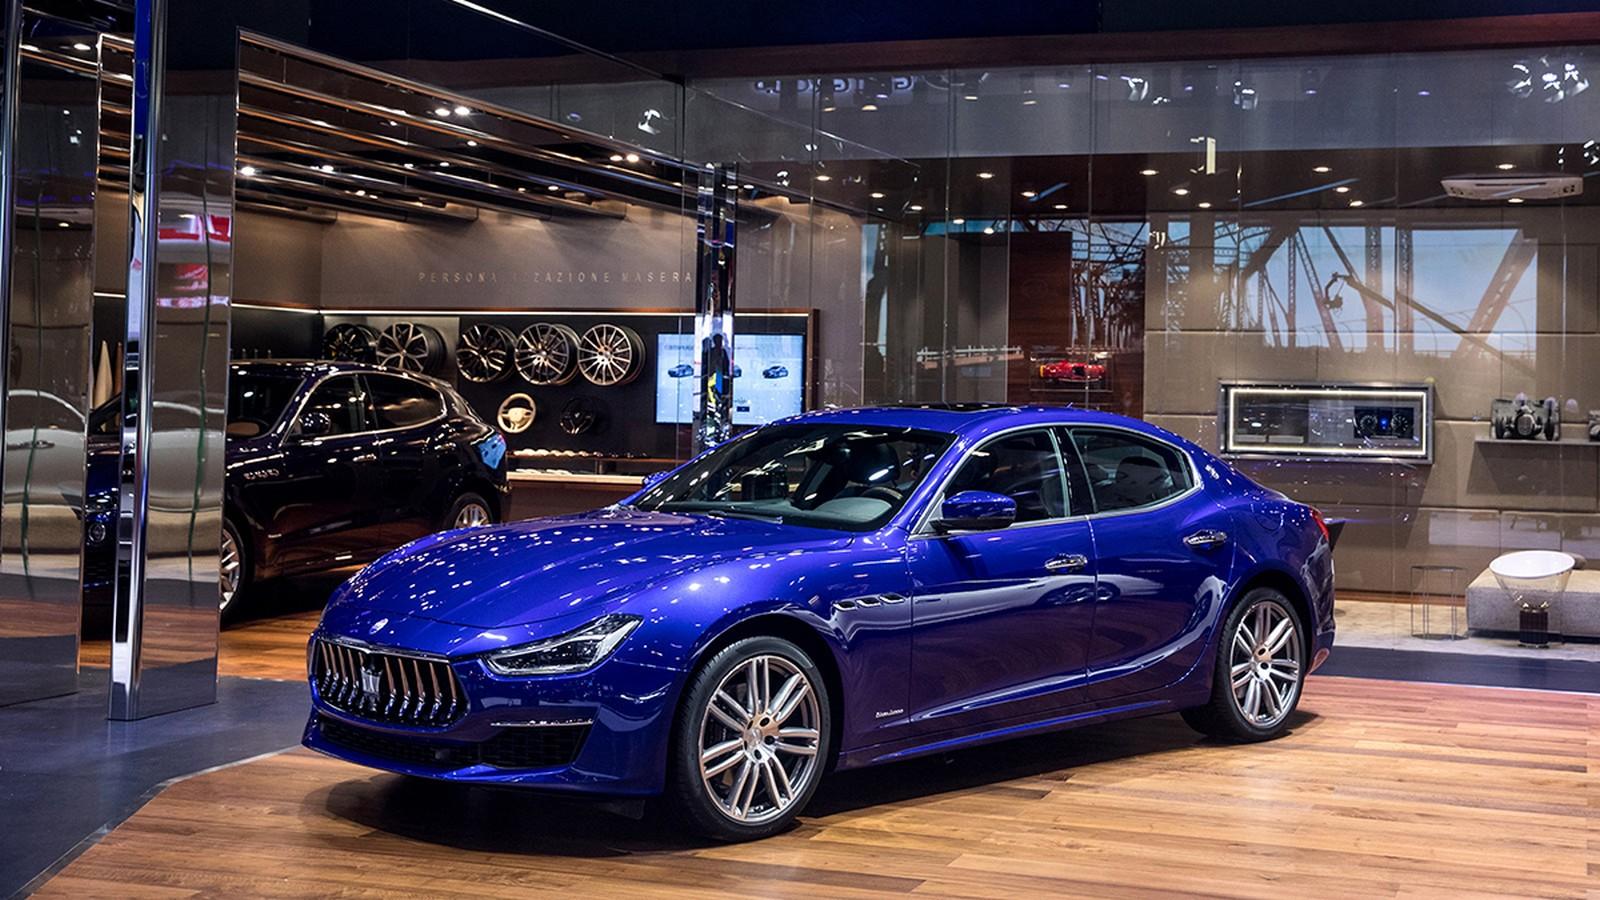 Maserati stand at Auto China 2018_Ghibli GranLusso MY18